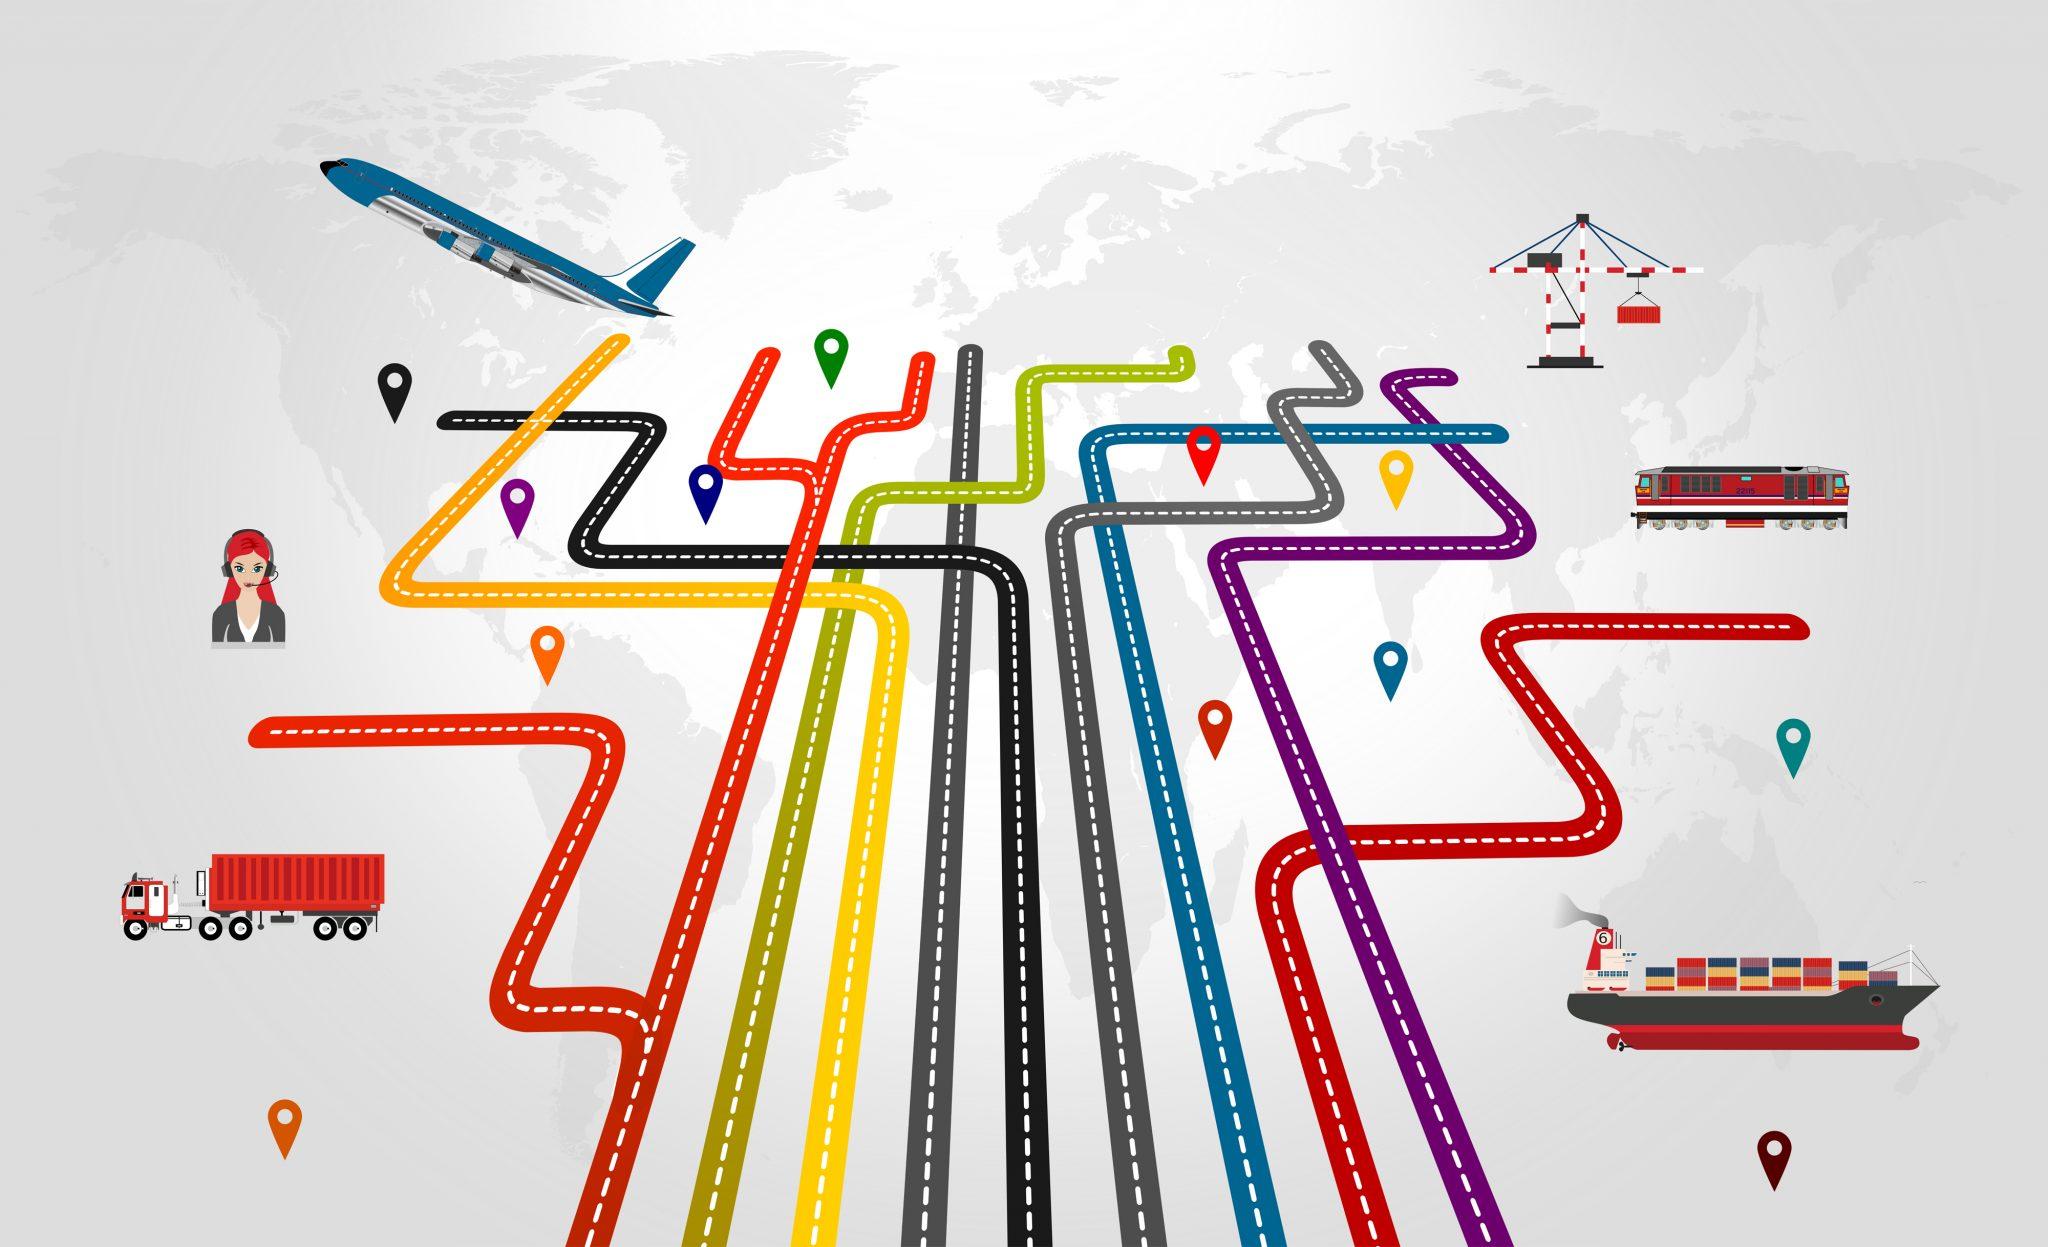 Global logistics concept